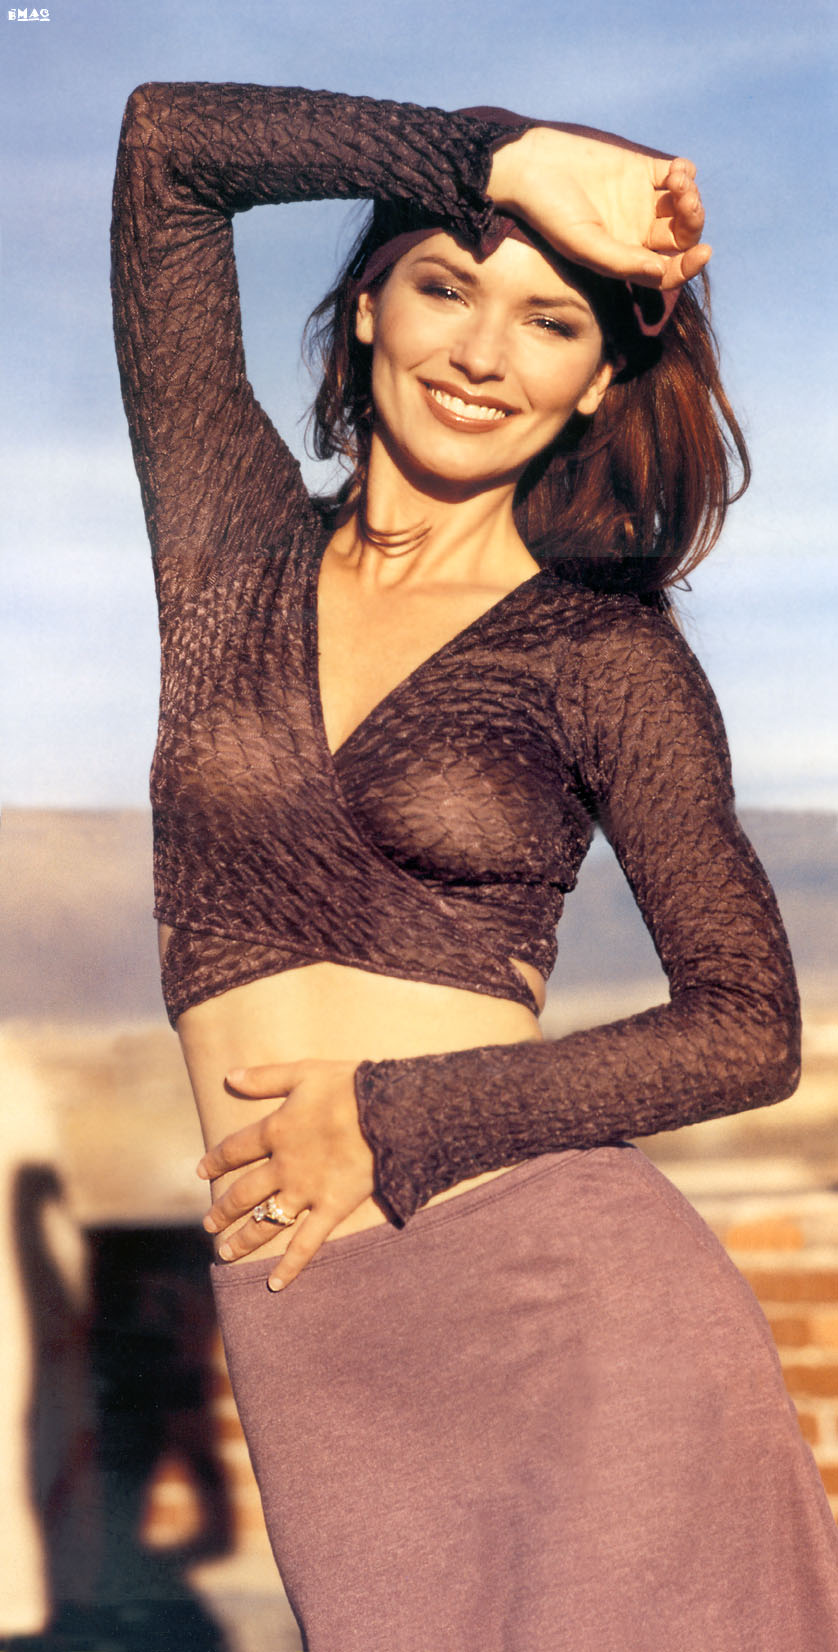 Fotos de desnudos de Shania Twain filtradas en internet